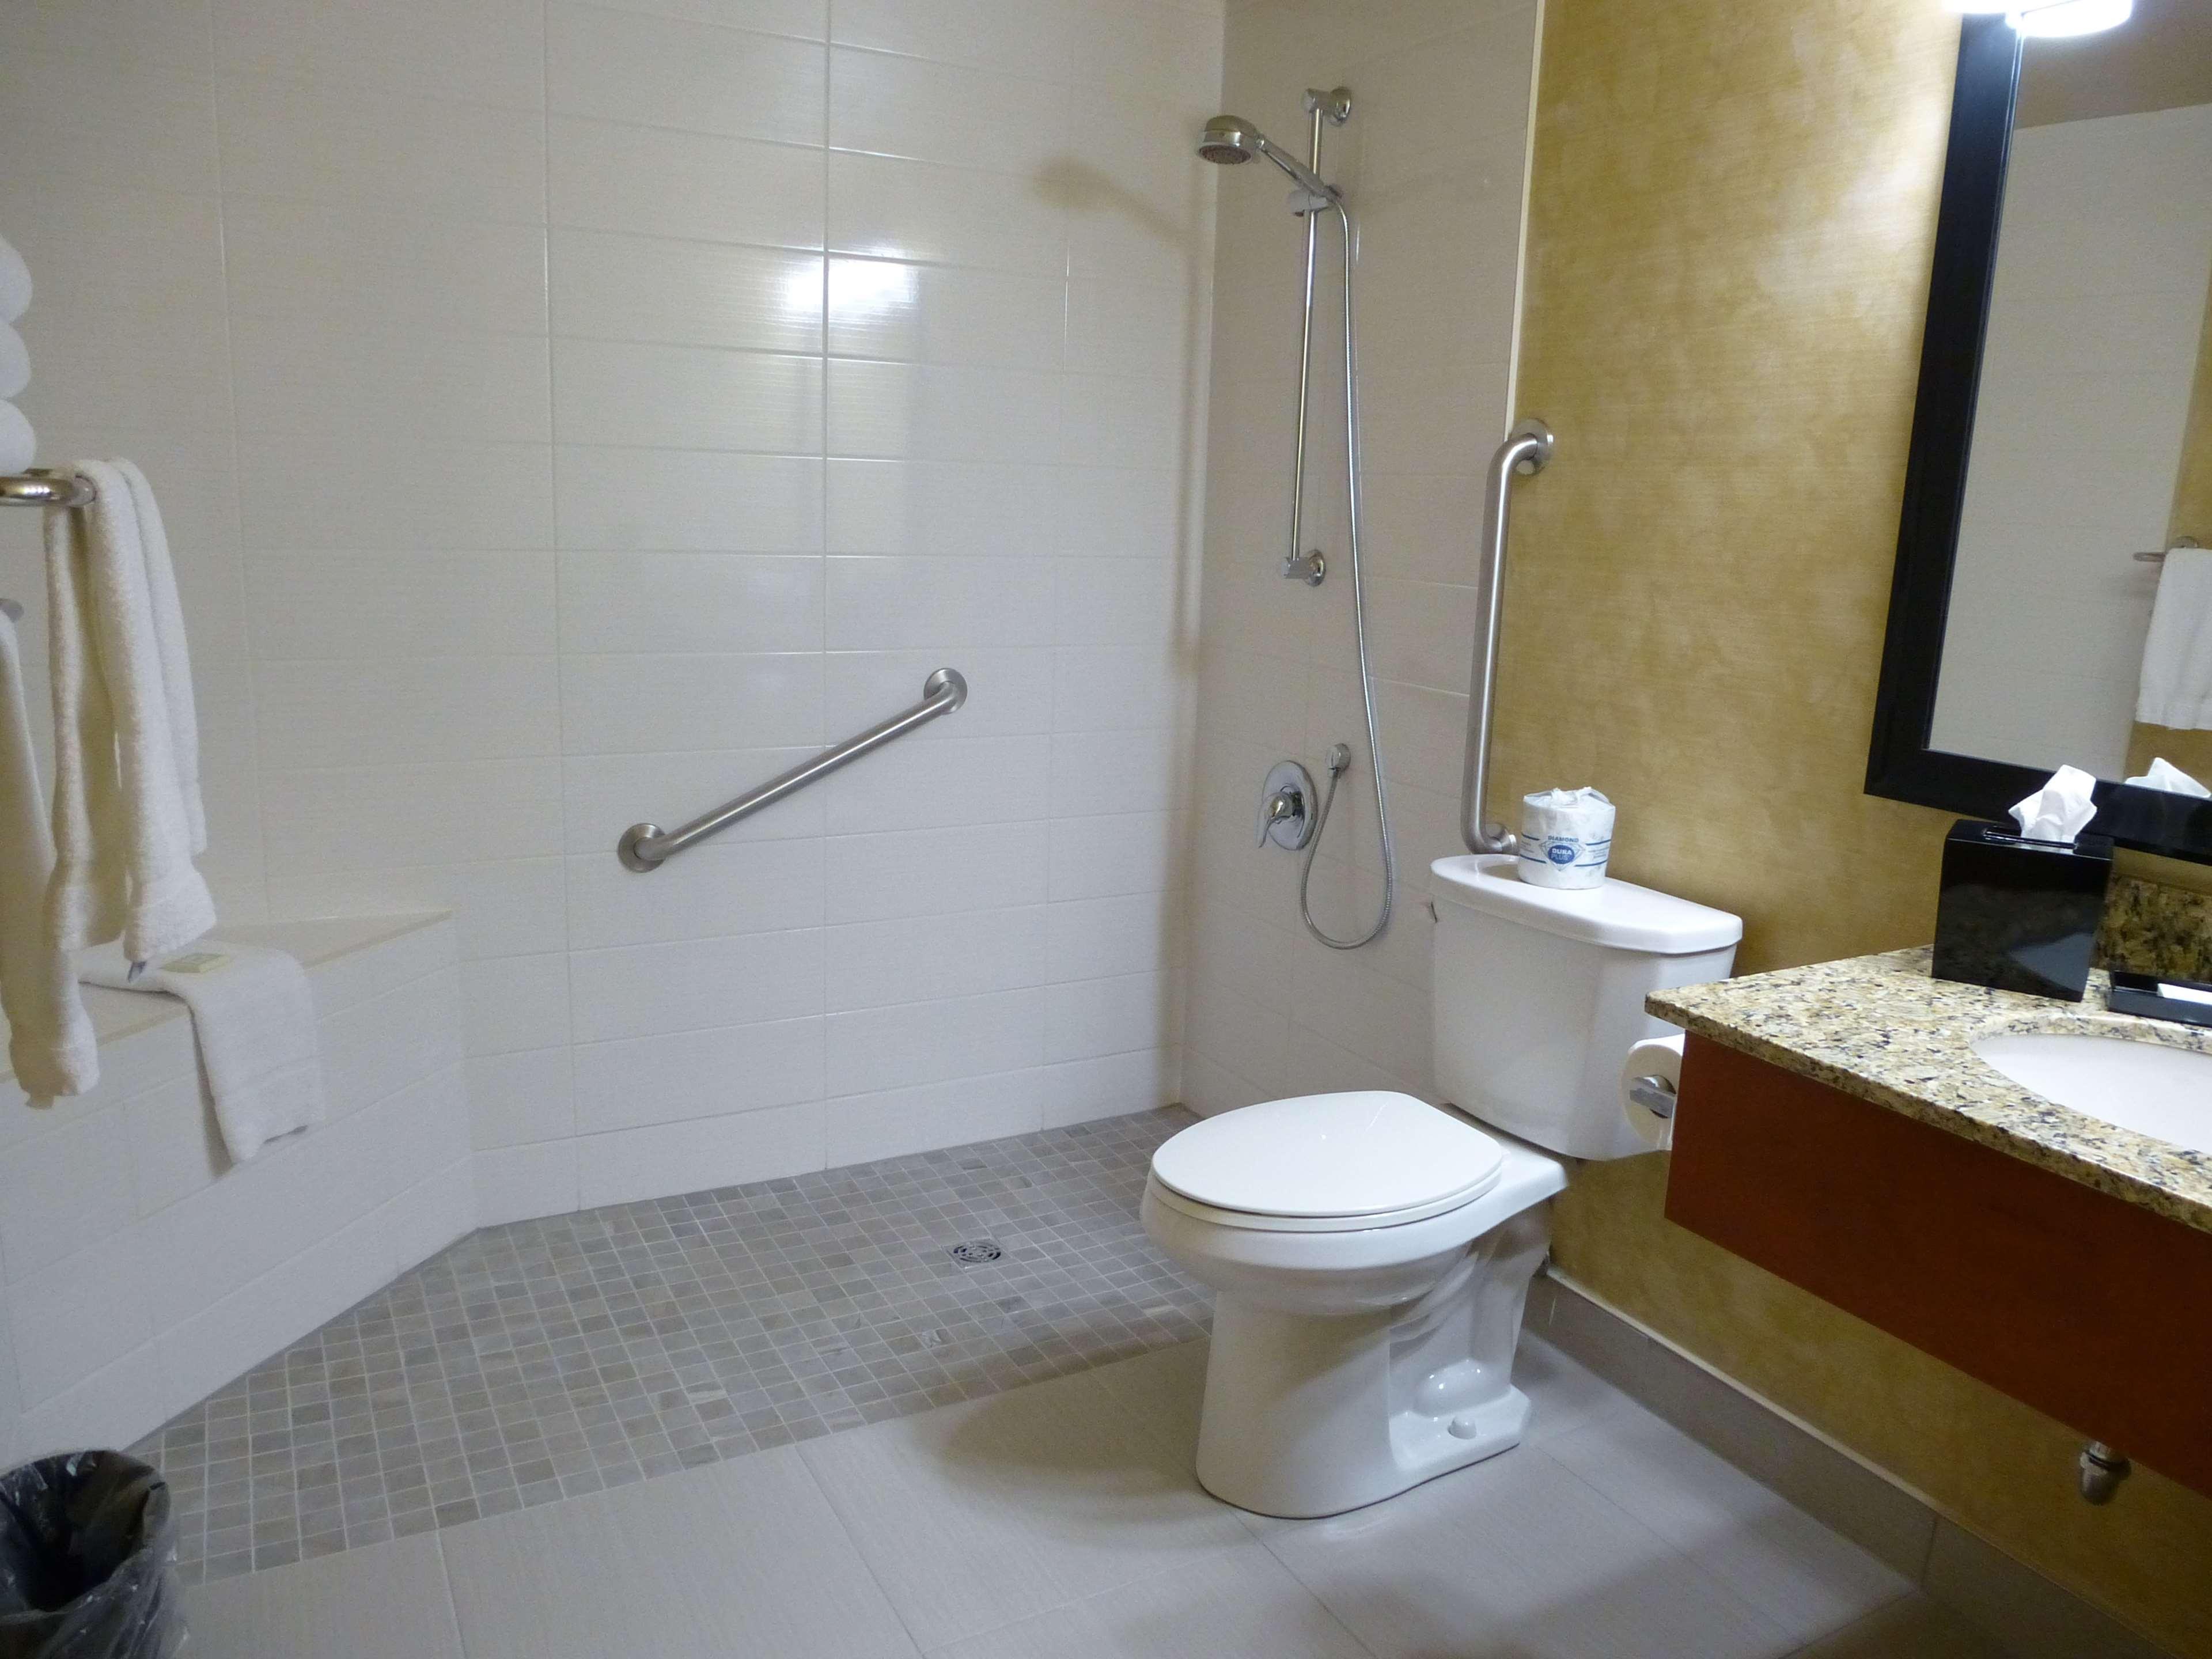 Best Western Plus Rose City Suites in Welland: Guest Bathroom Roll-in Shower